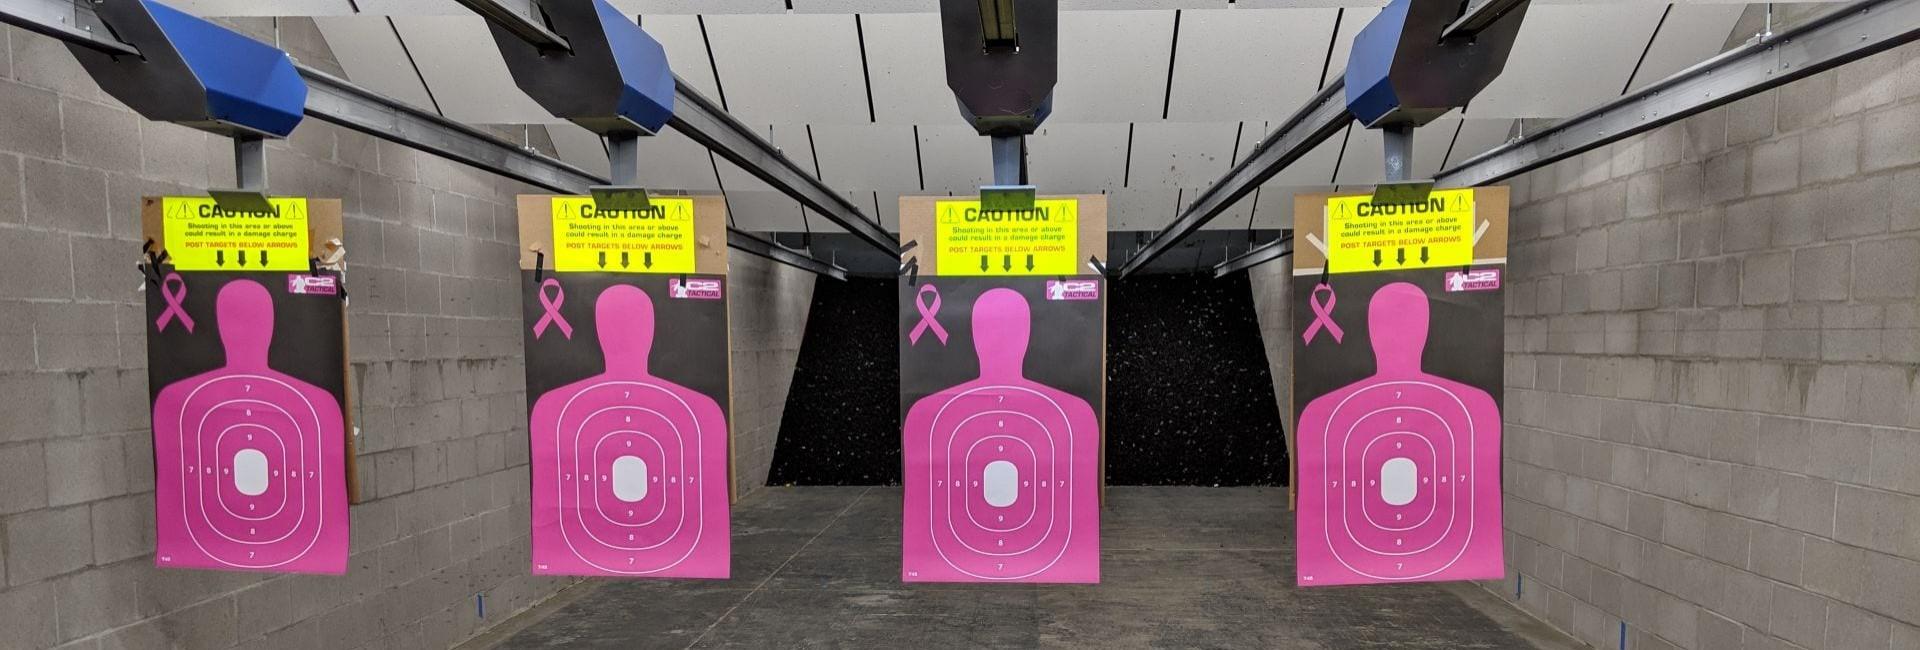 Gun Range In Scottsdale